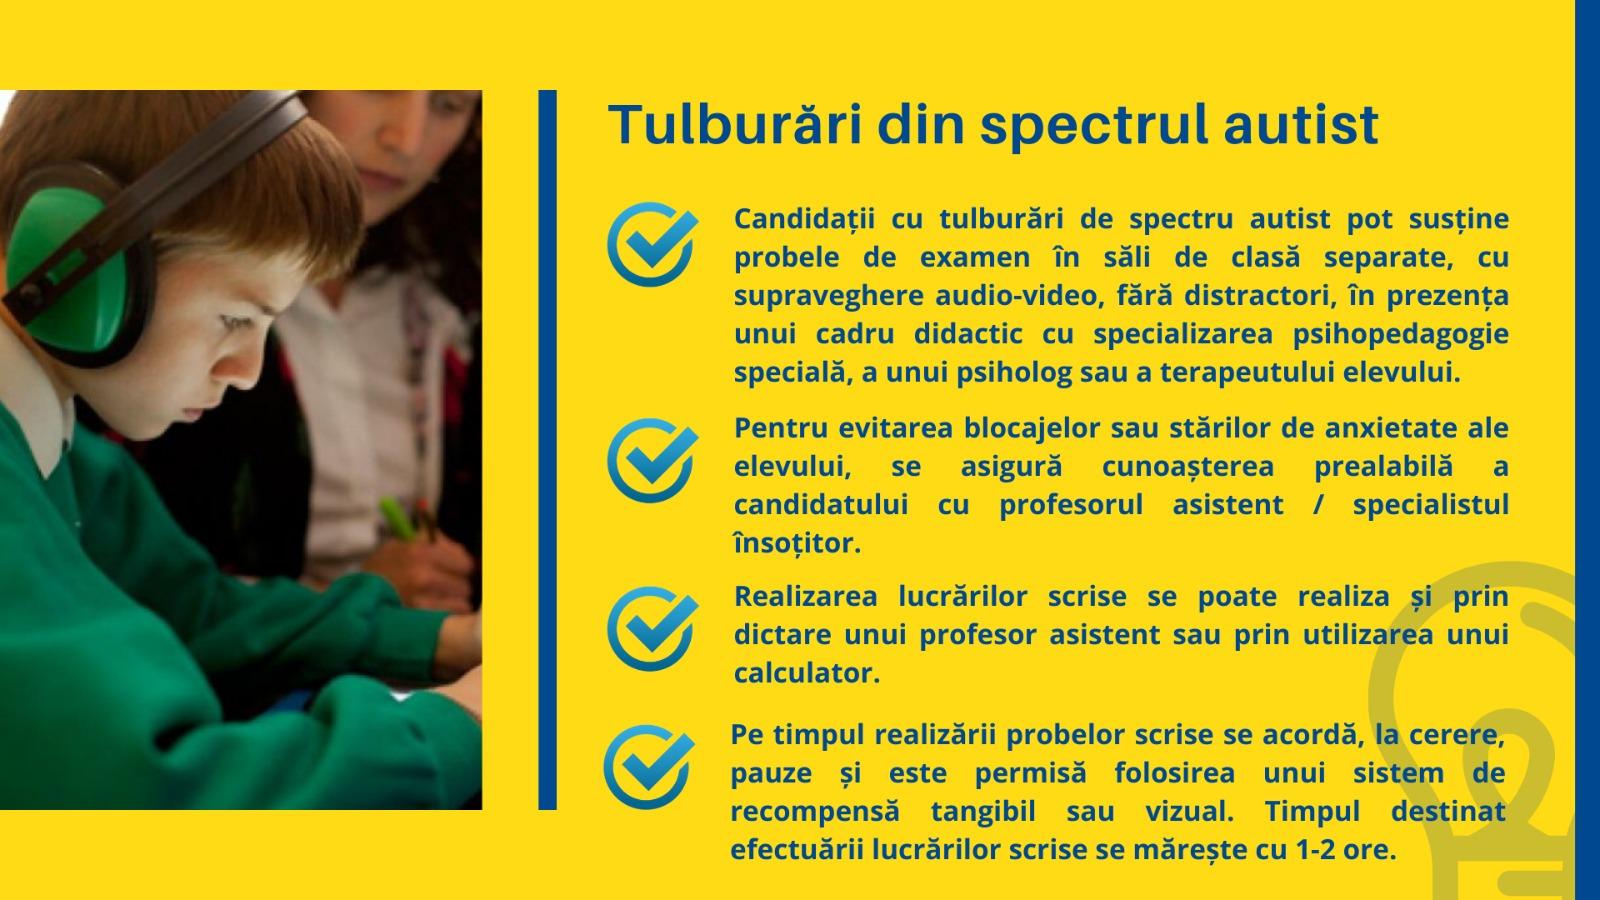 videoclip despre deficiențe de vedere miopia la copiii preșcolari